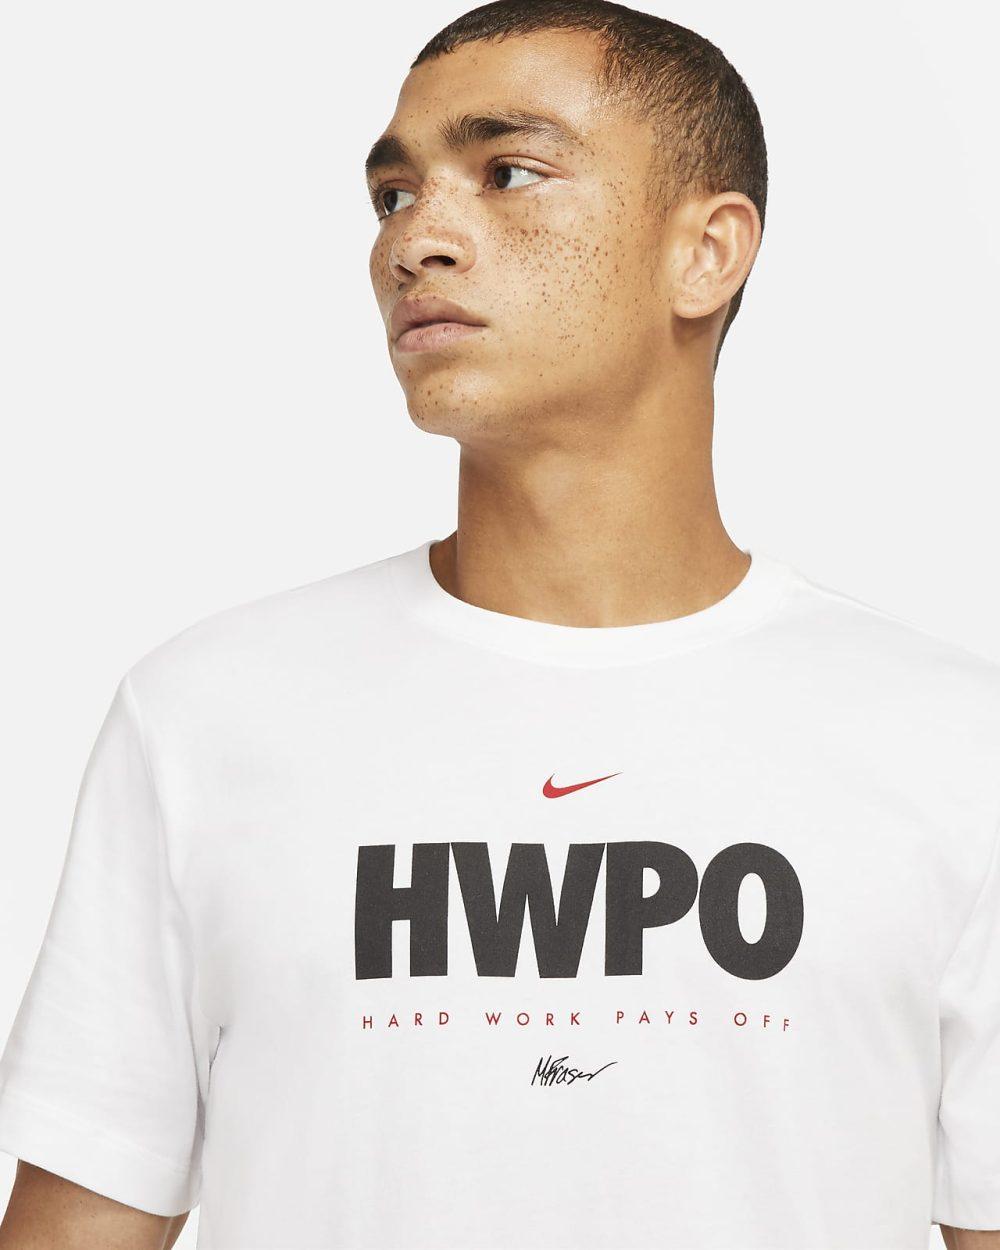 dri-fit-hwpo-training-t-shirt-zJ85Rw (1)